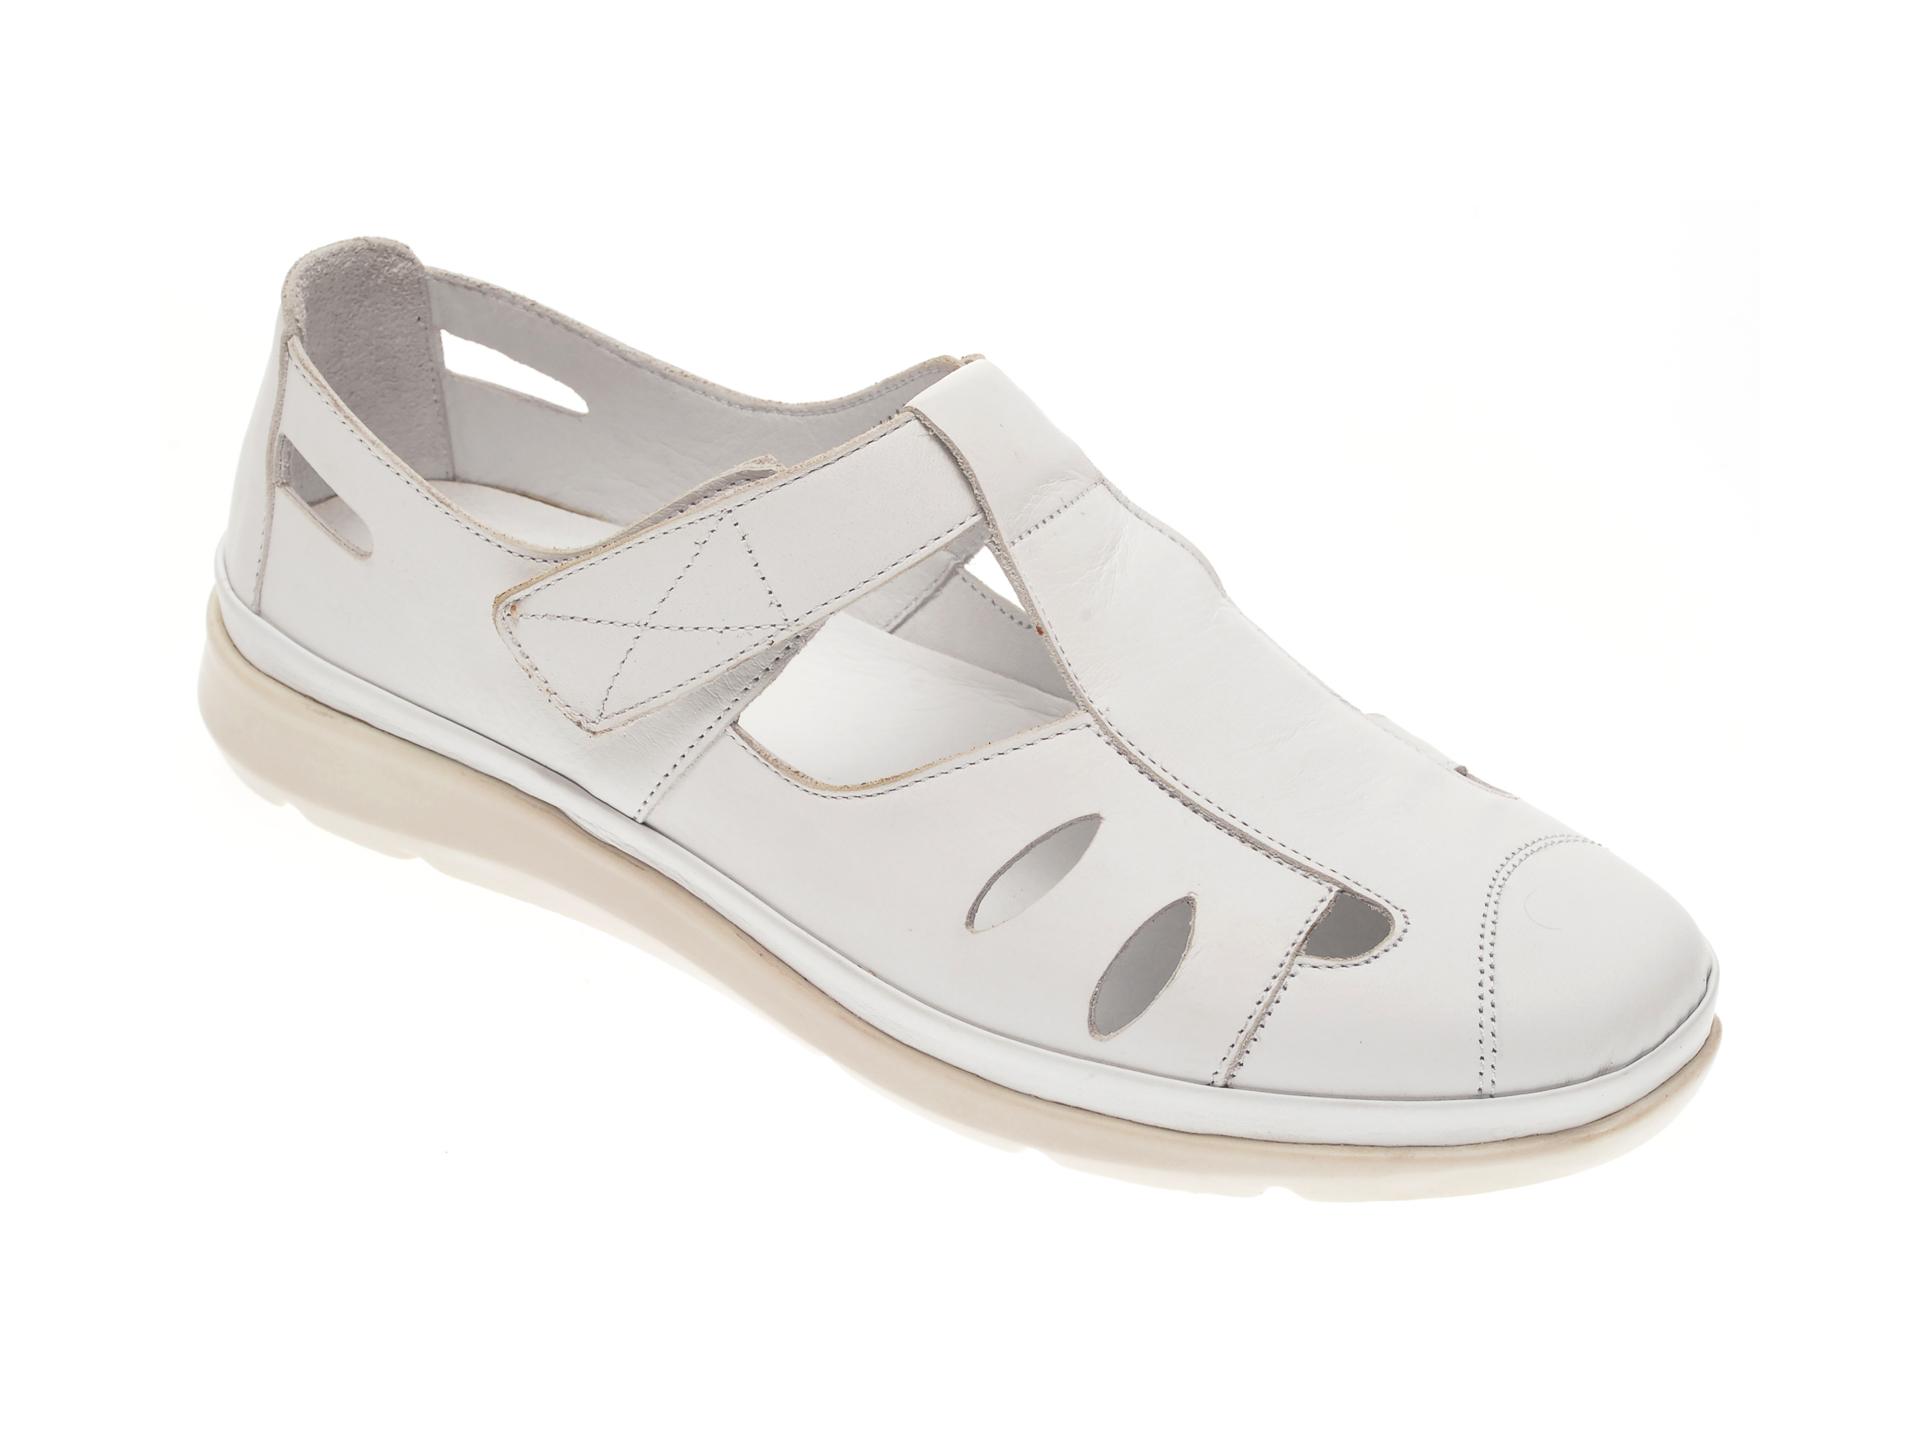 Pantofi MARCHA albi, 605, din piele naturala